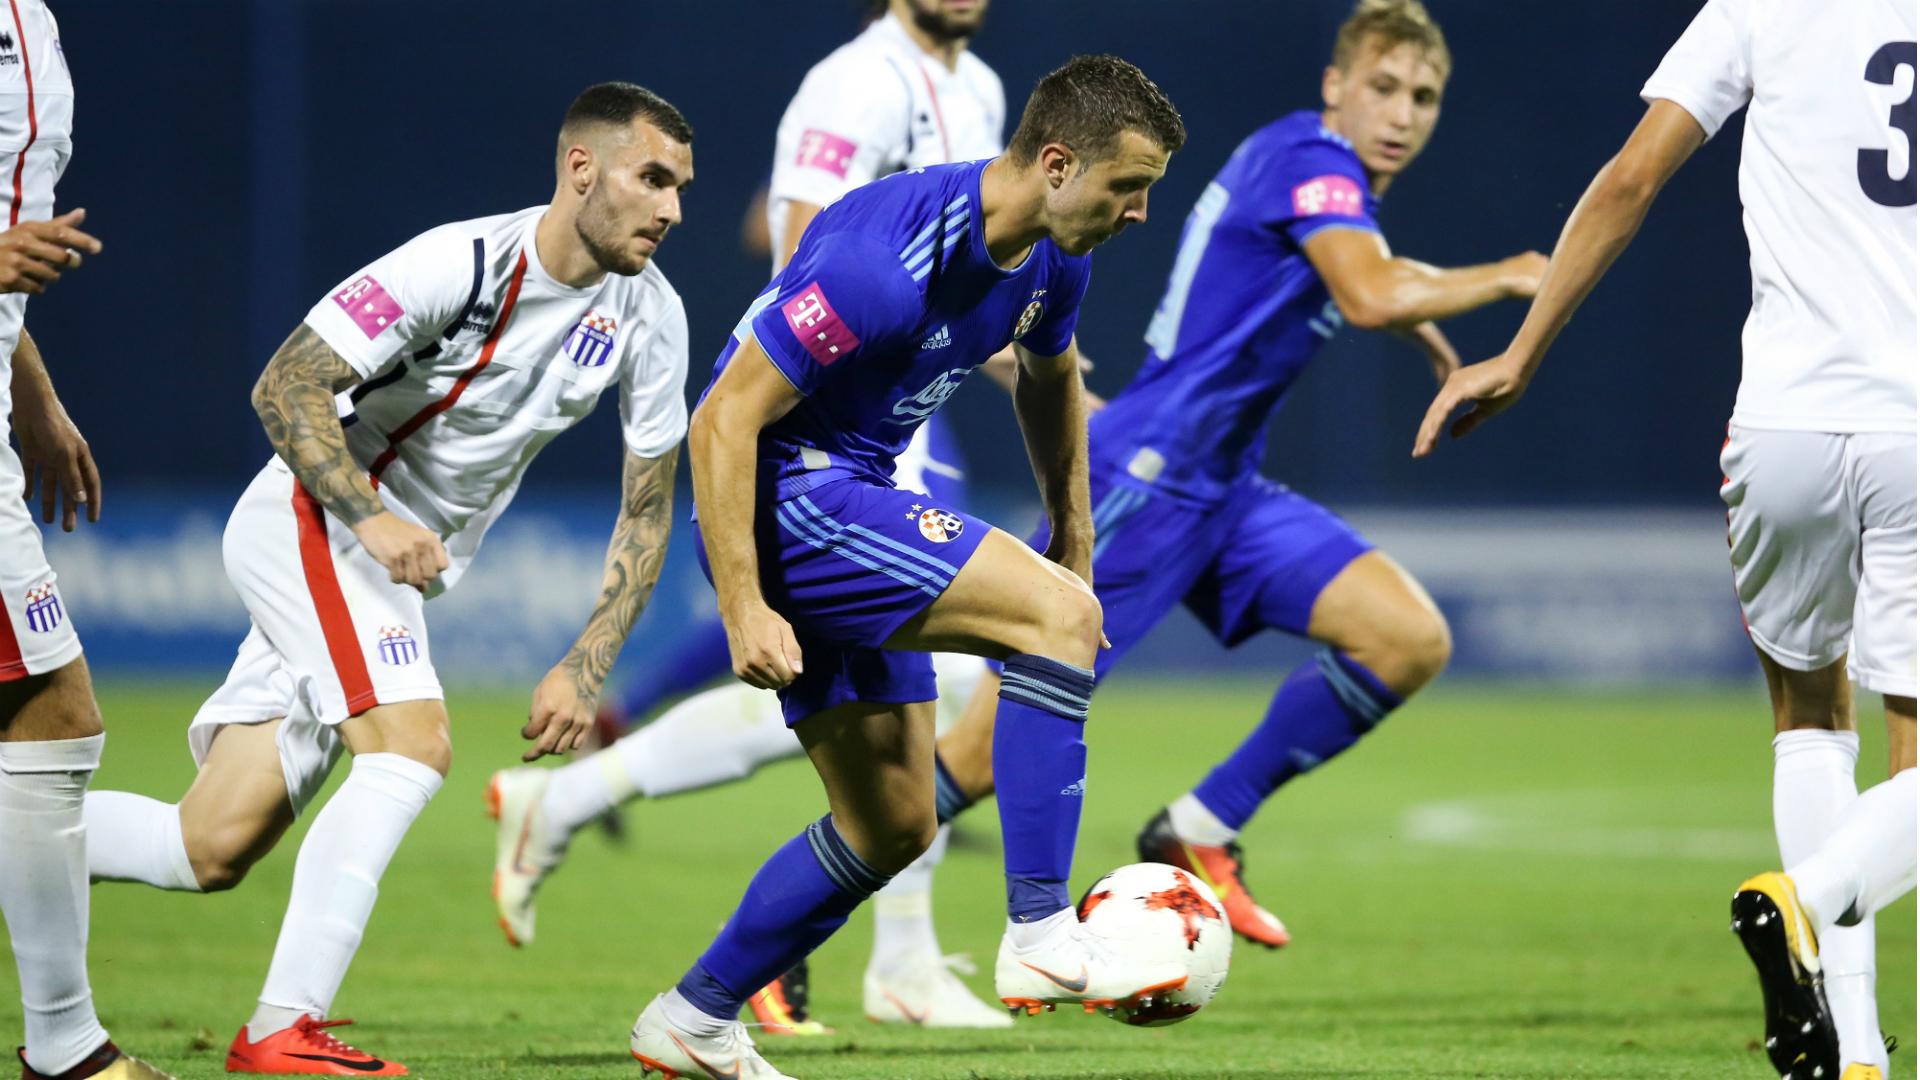 Armin Hodzic Dinamo Zagreb Rudes 1. HNL 27072018